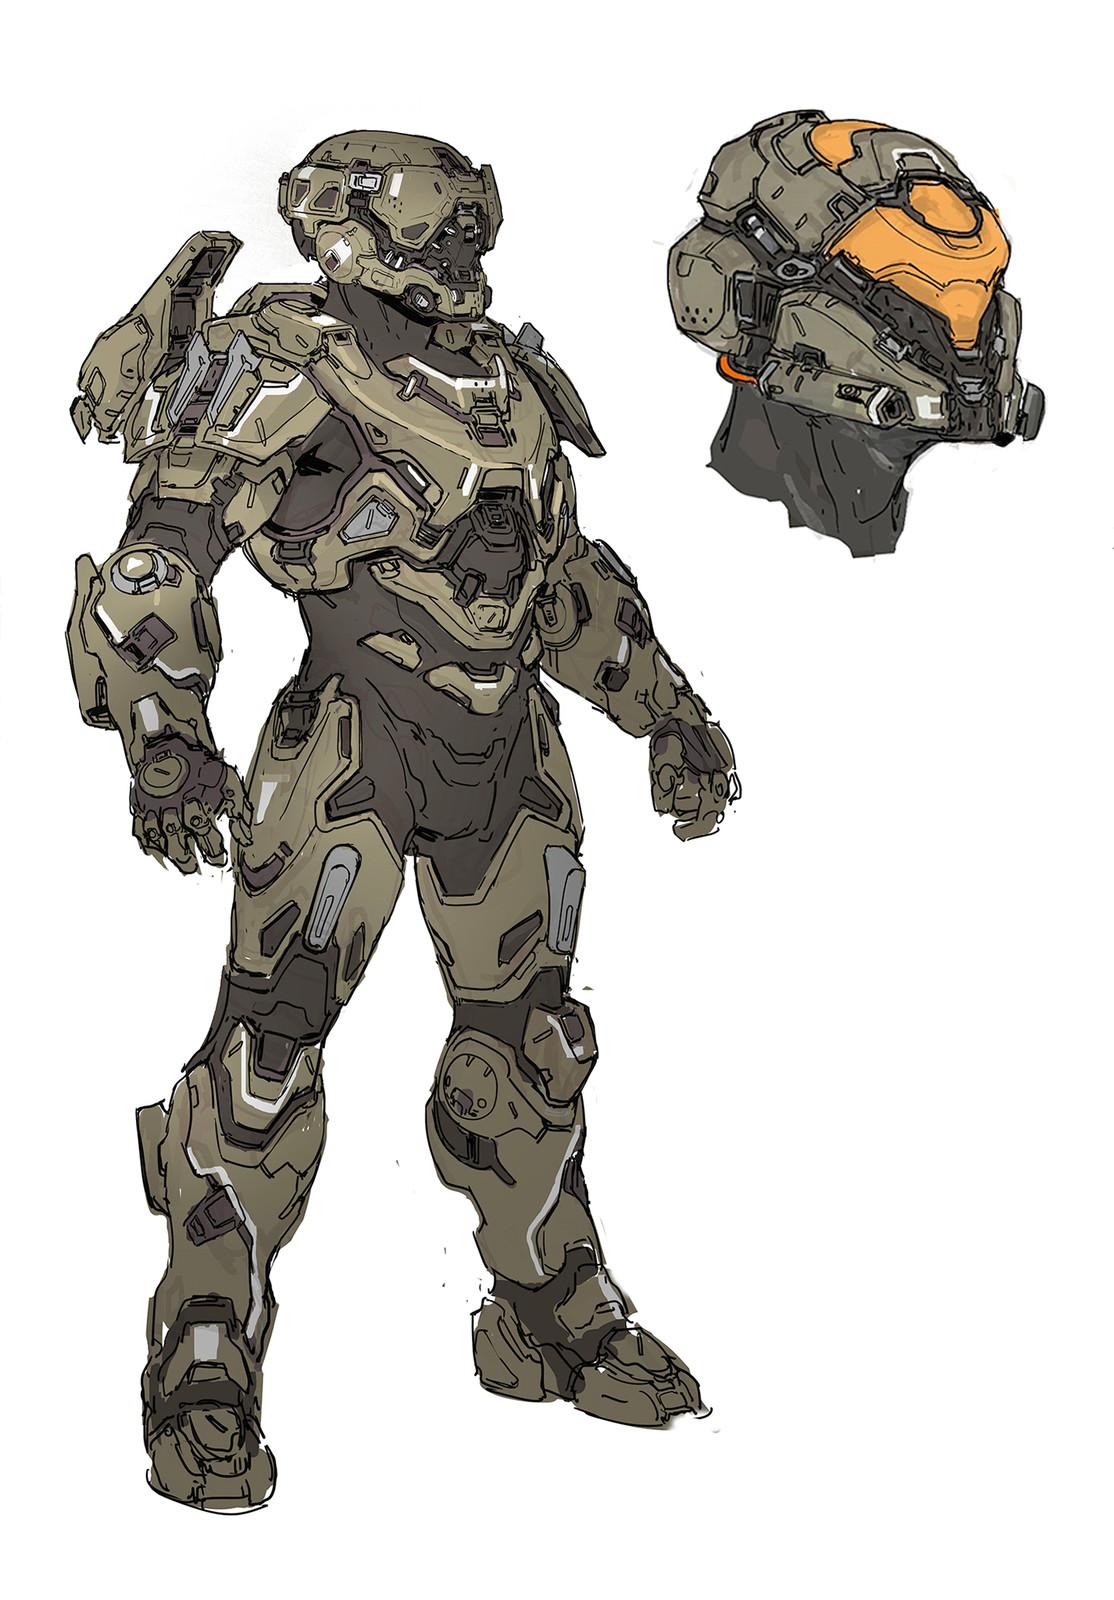 Halo 5- Recluse Armor design